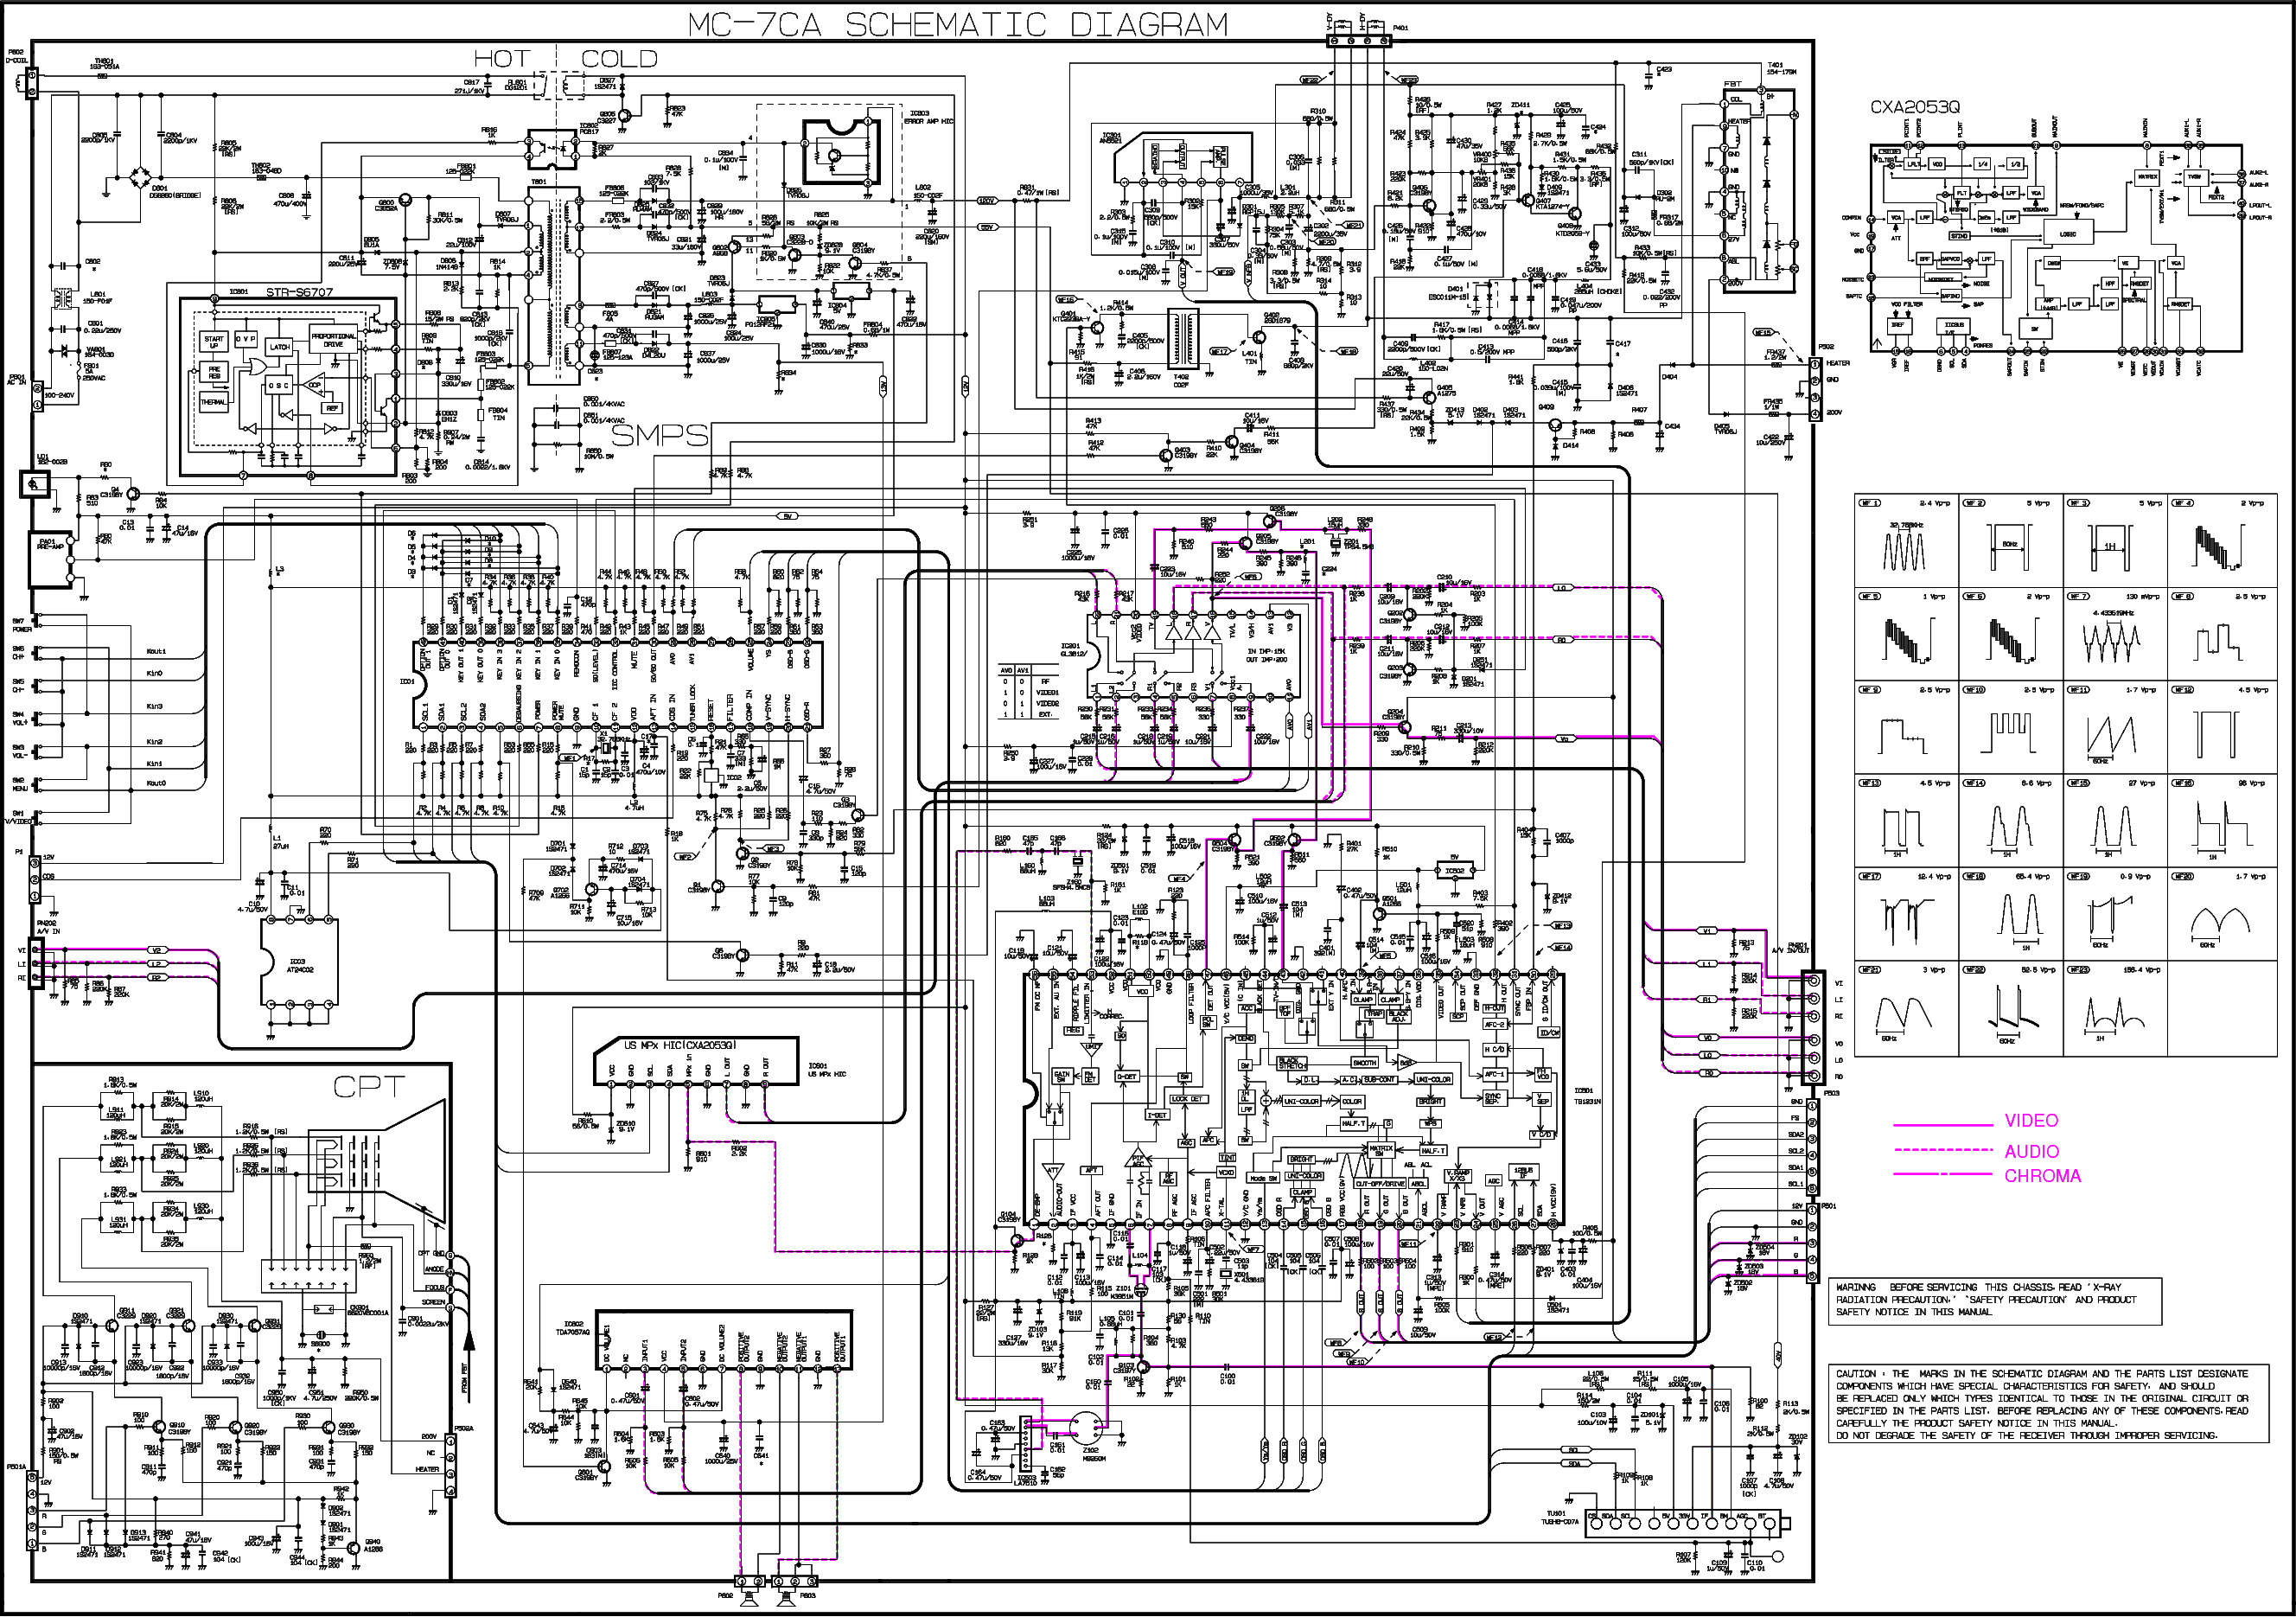 lg tv circuit diagram pdf diagram lg mc7ca chassis tv d service manual schematics